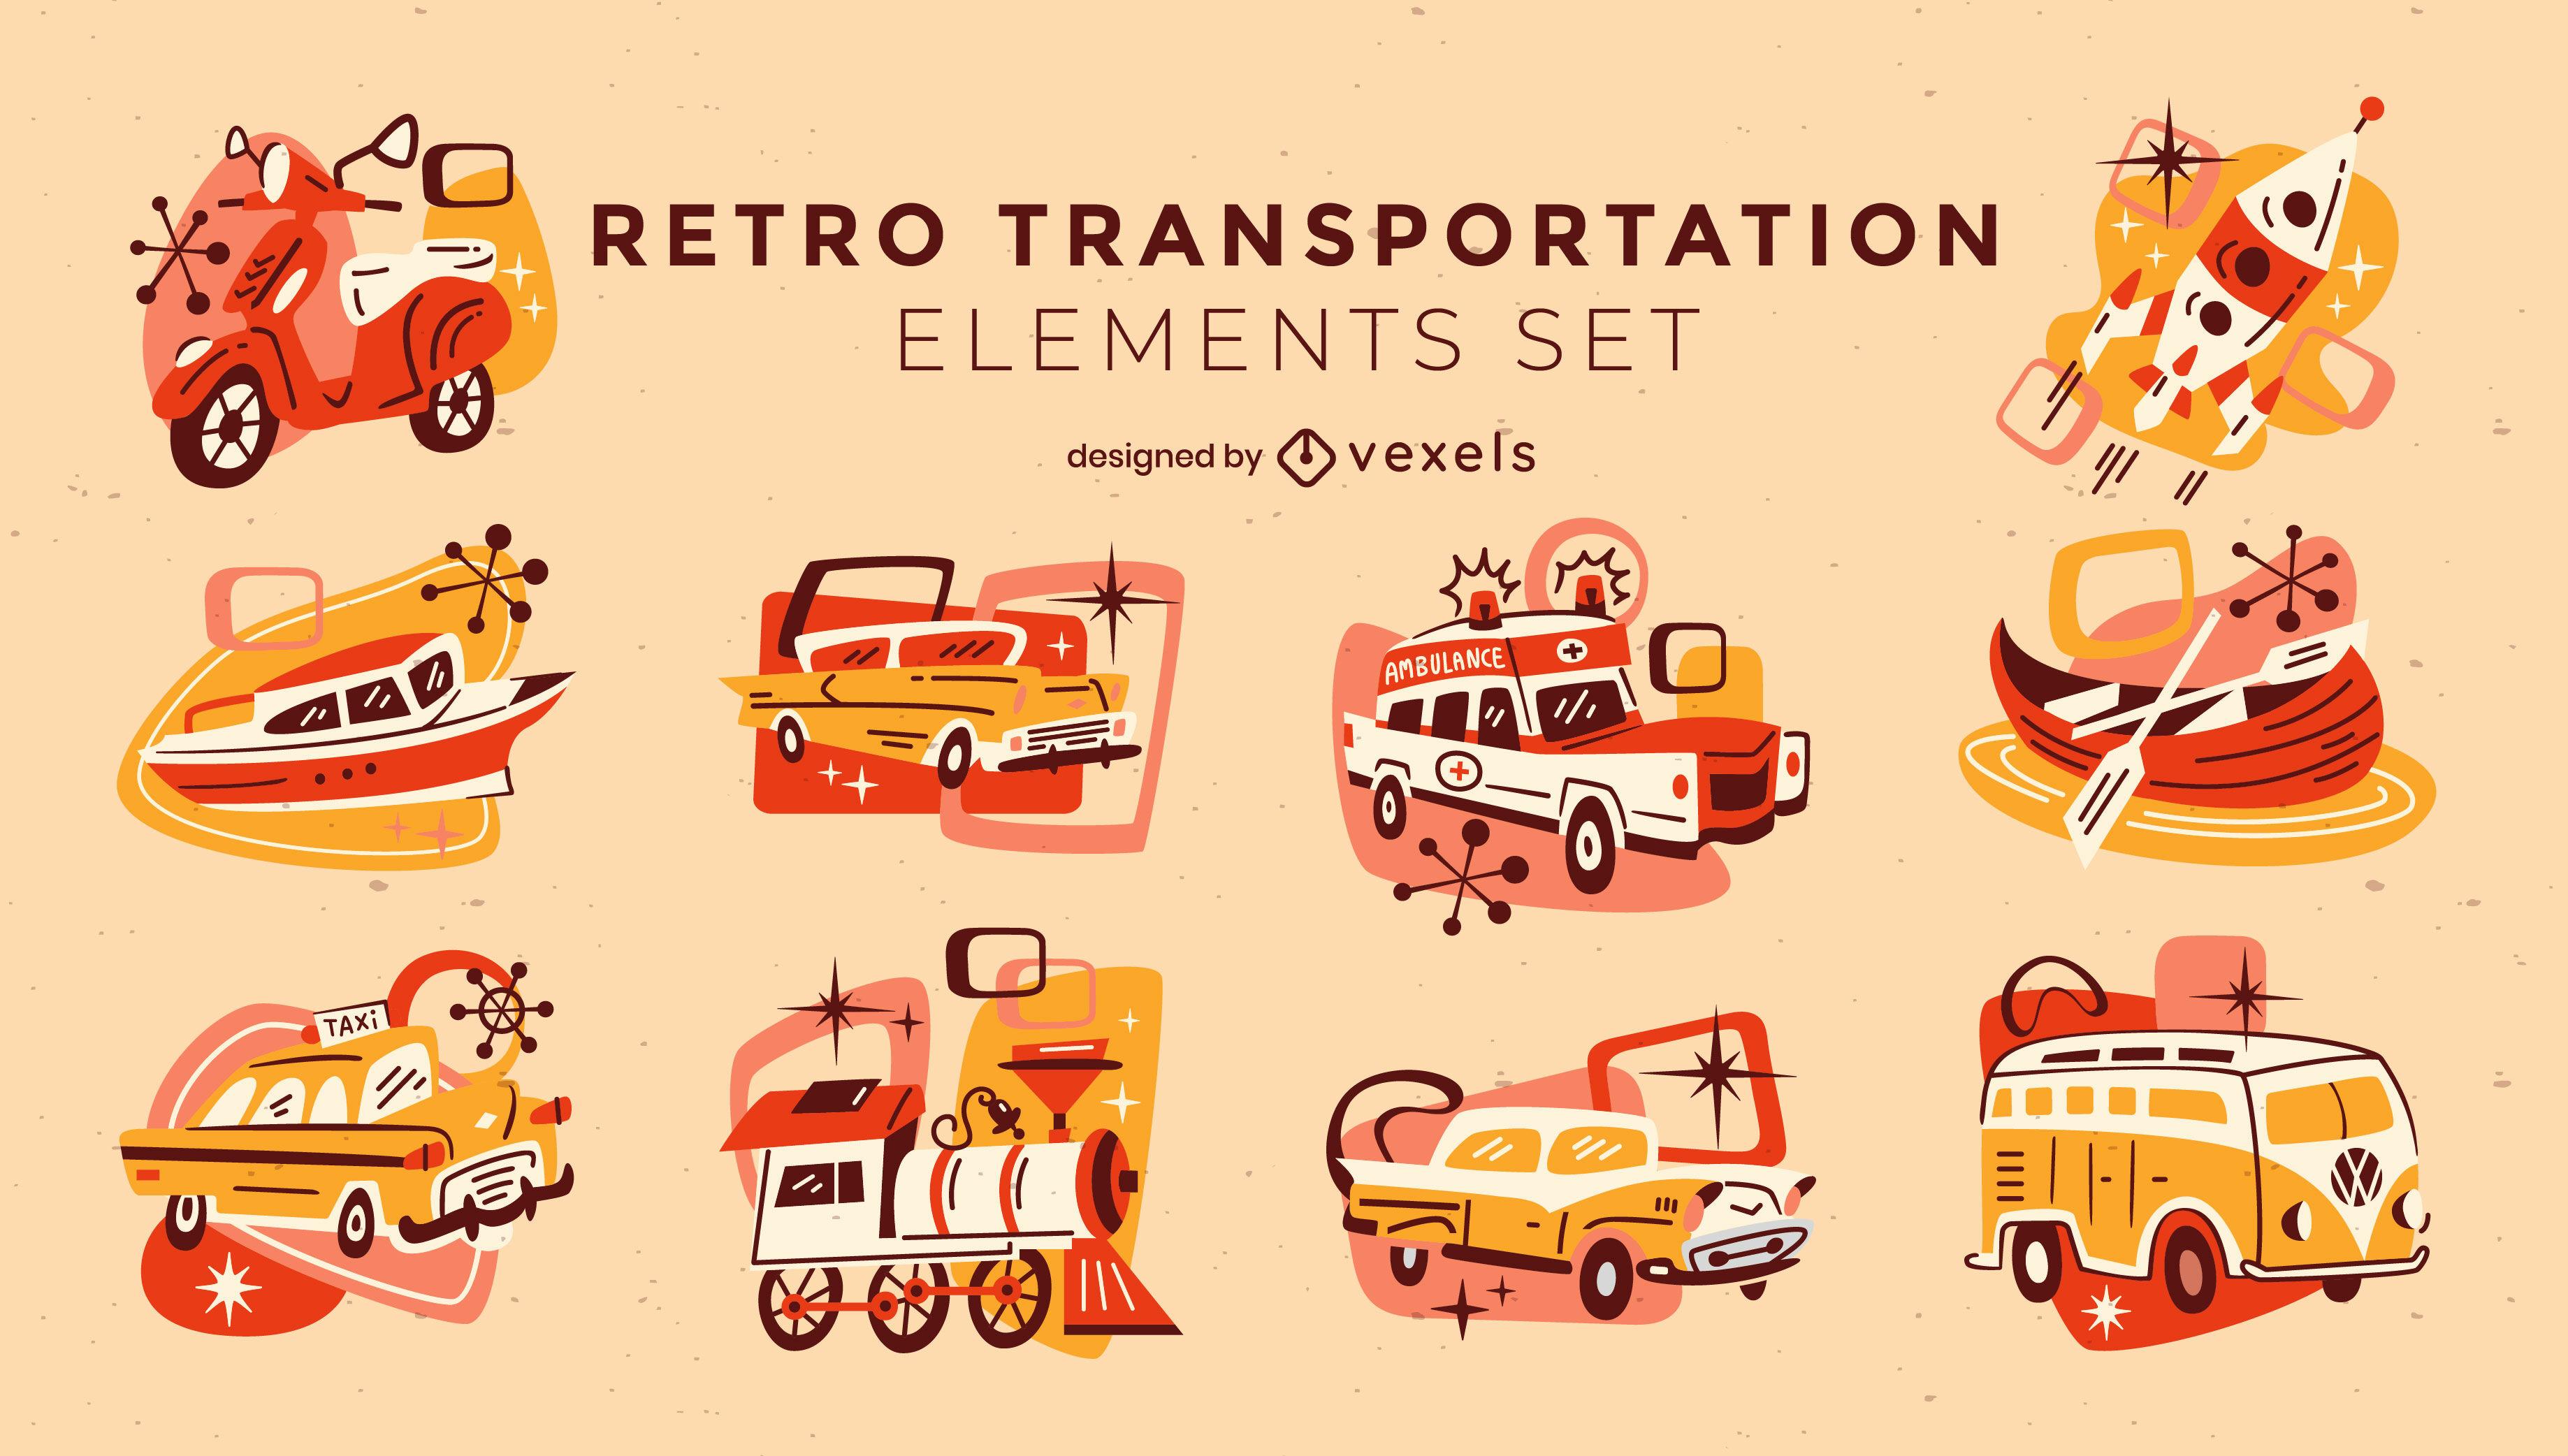 Retro-Cartoon-Fahrzeuge und Transportset